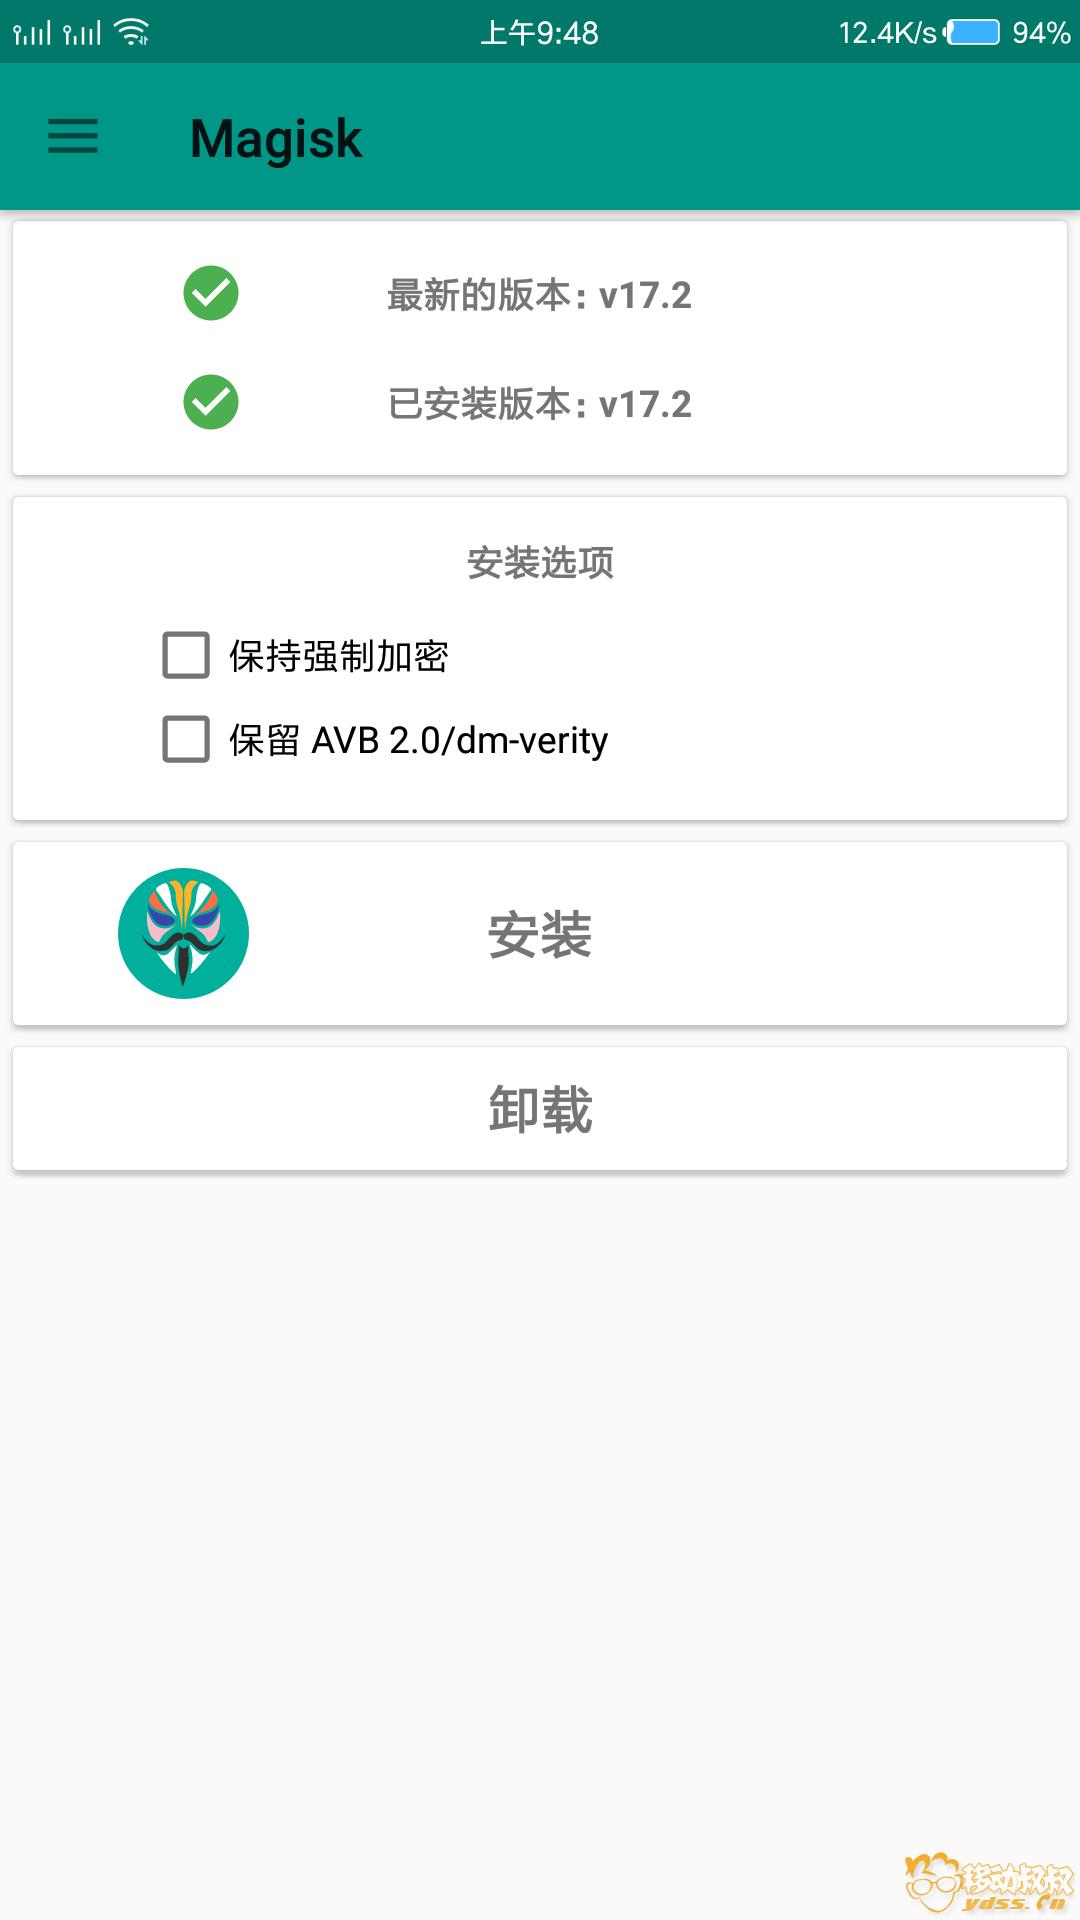 Screenshot_2018-10-01-09-48-12-220_com.topjohnwu.magisk.png